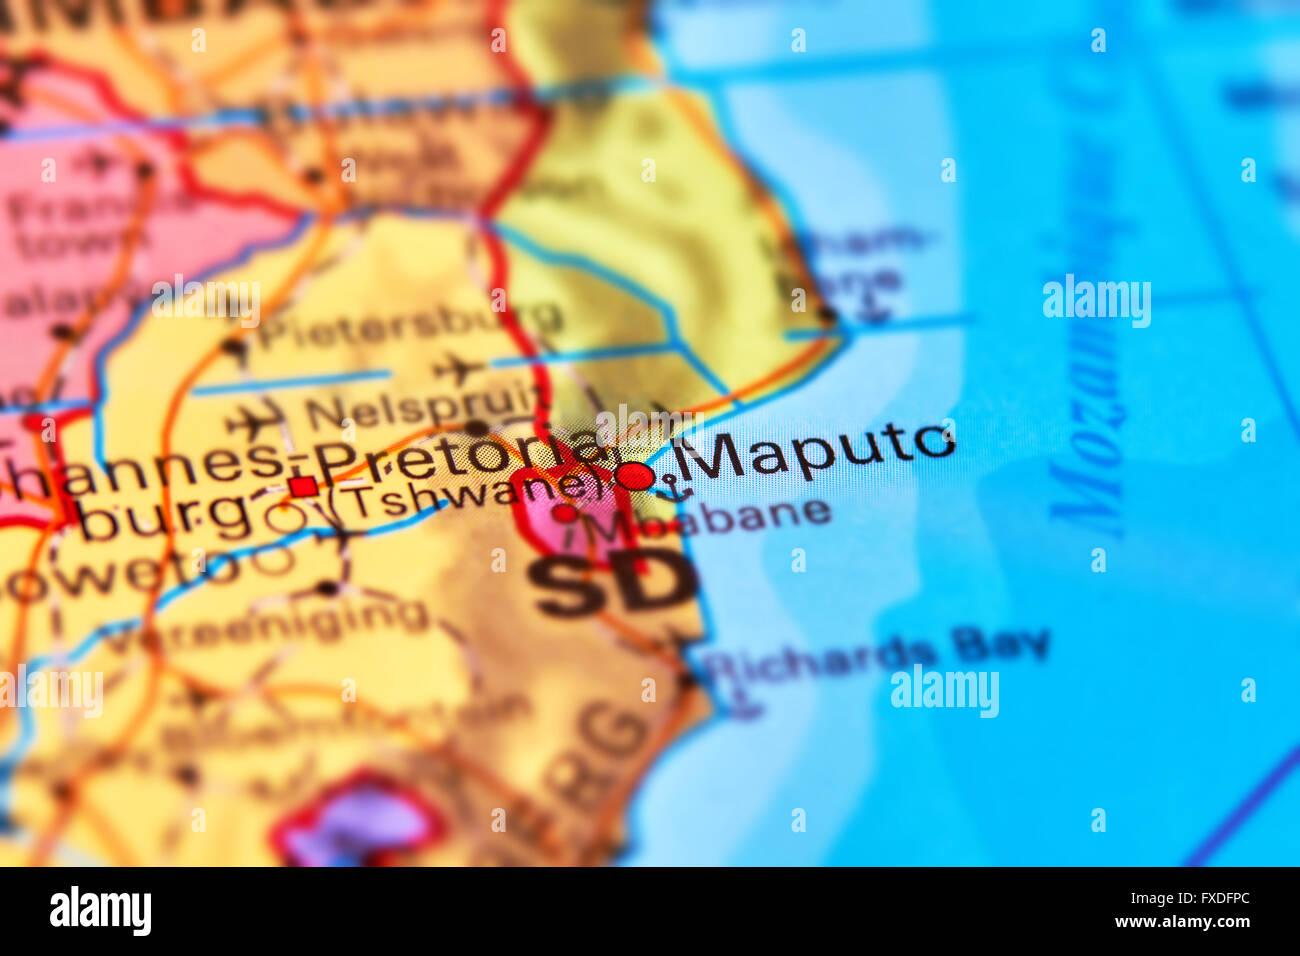 Maputo, la capital de Mozambique en el mapa del mundo Imagen De Stock